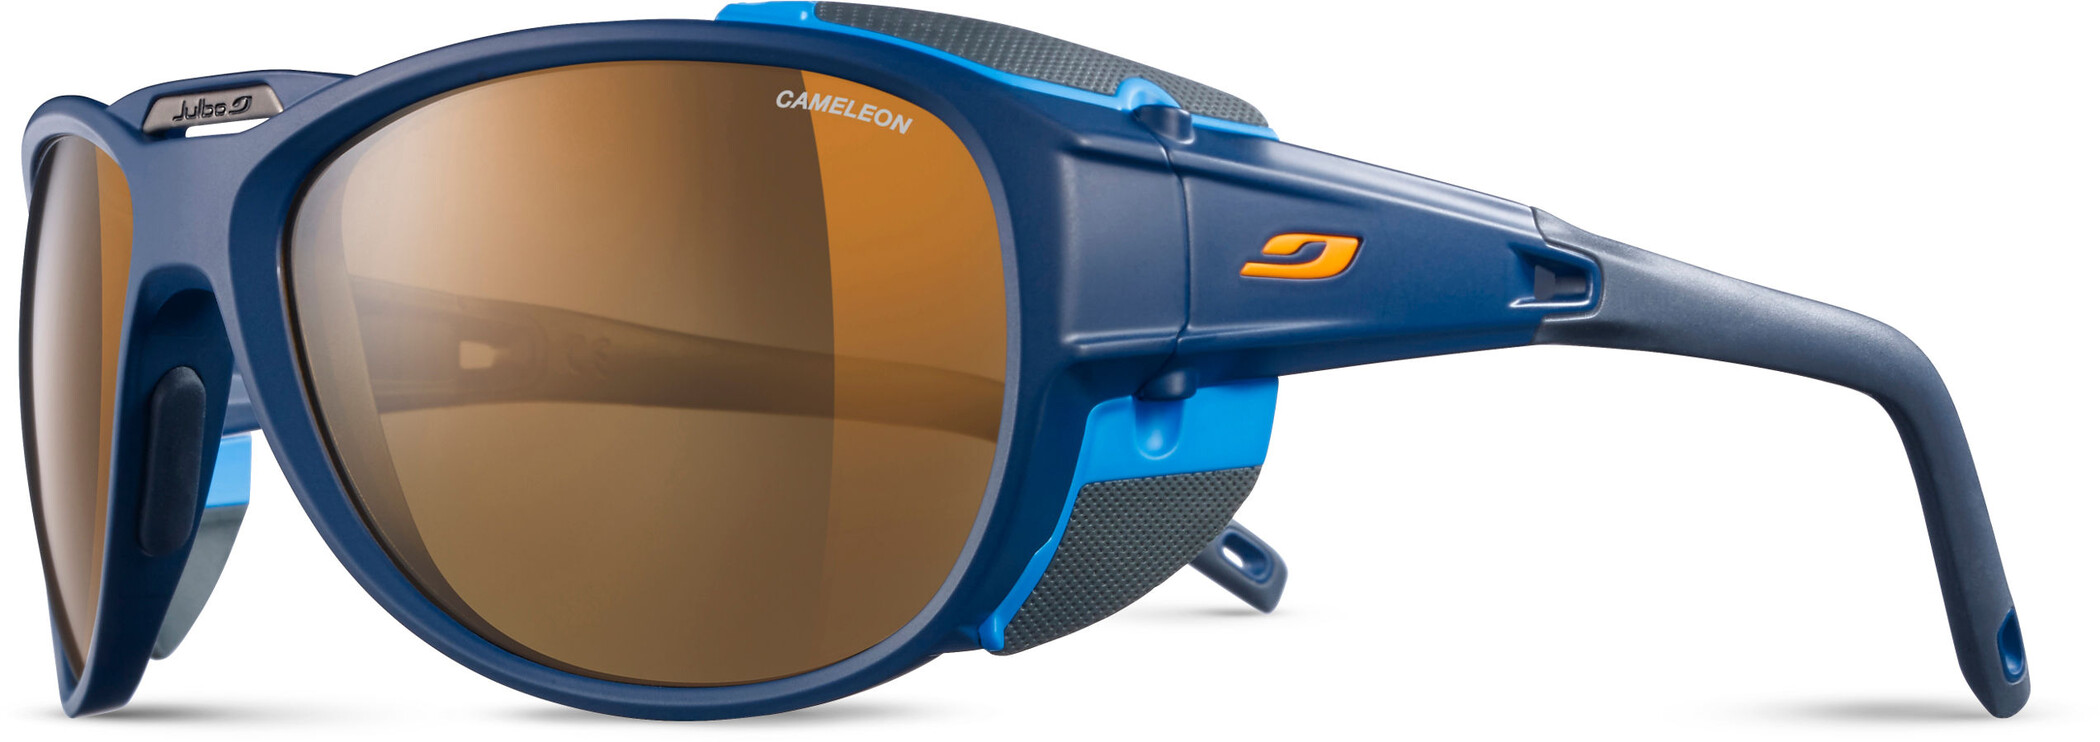 Julbo Exp*** 2.0 Cameleon Solbriller, dark blue/blue-brown (2020) | Glasses